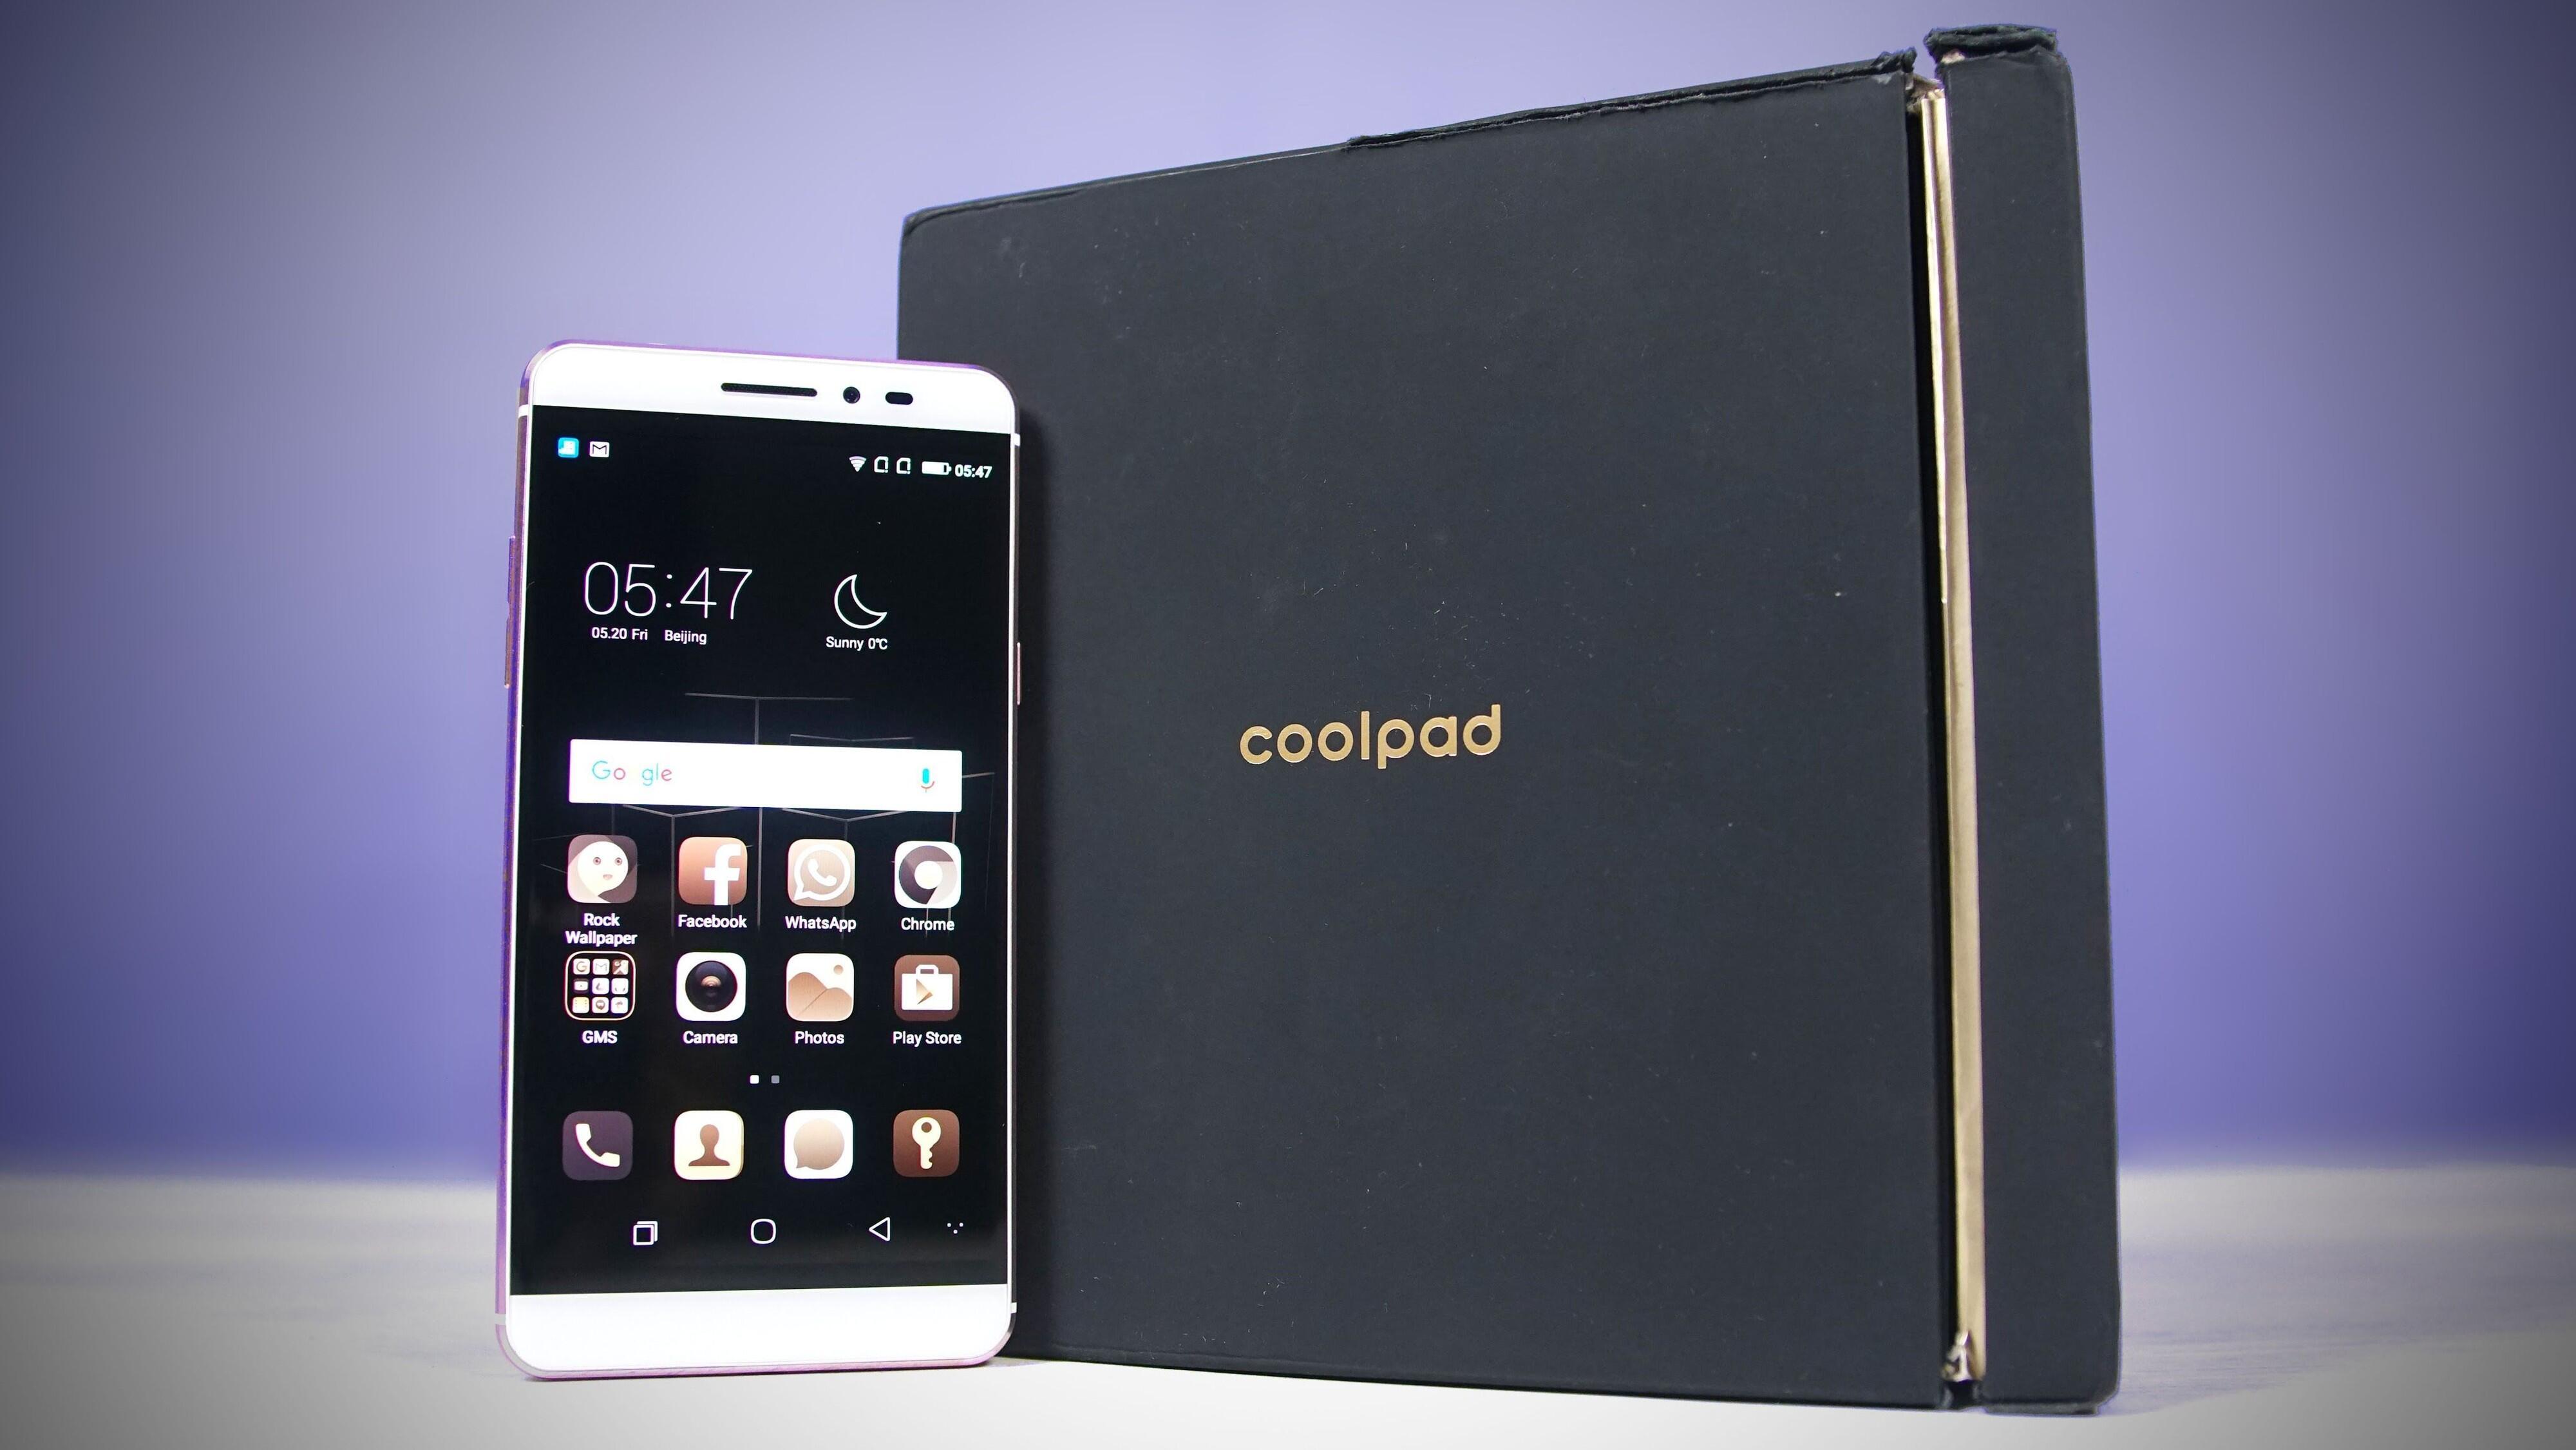 Wajib Dibeli, 5 Smartphone Asal China dengan Kualitas Terbaik